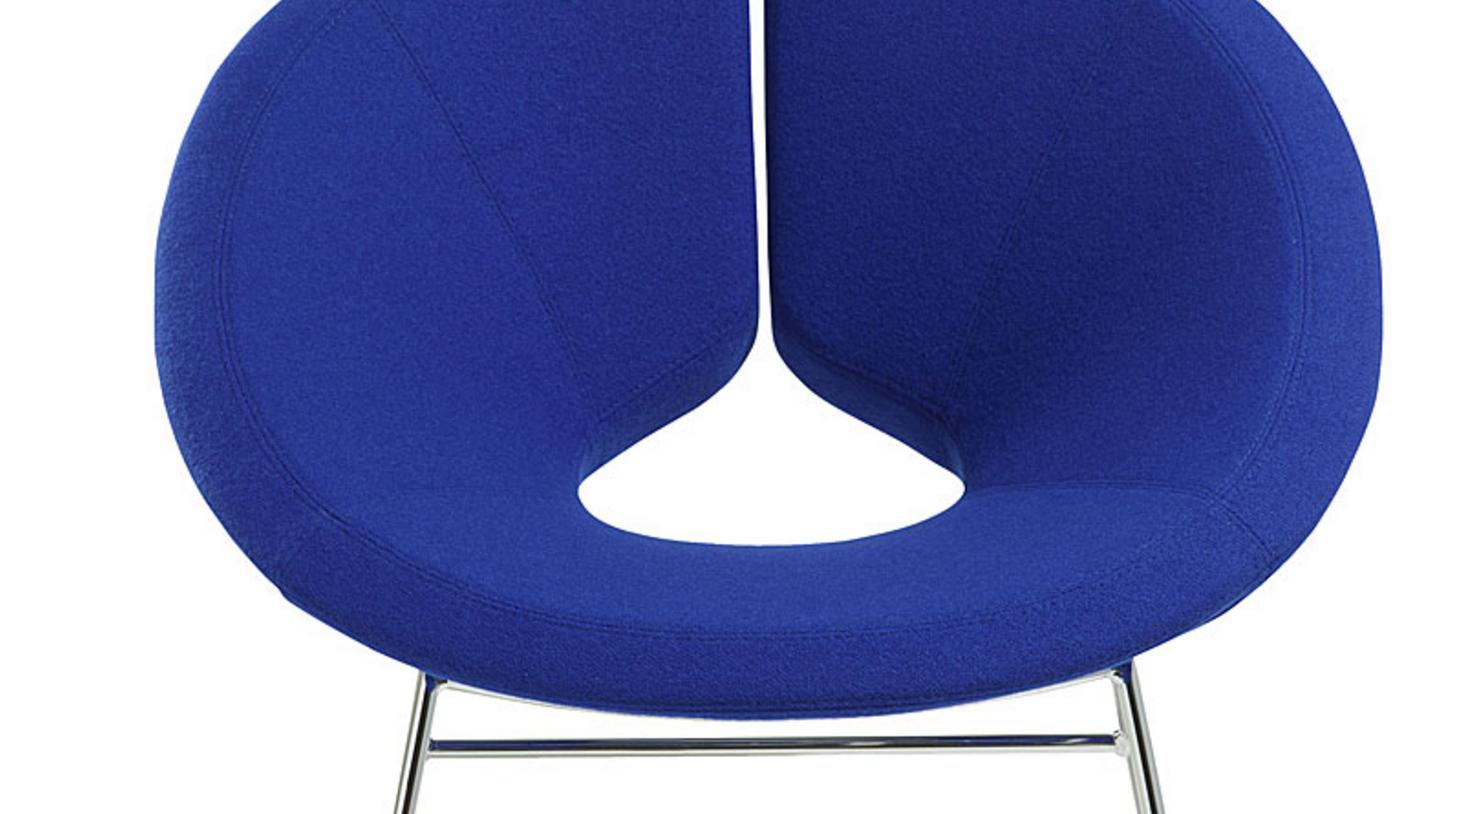 Little-apollo-chair-bar-stool-spaceist-blog